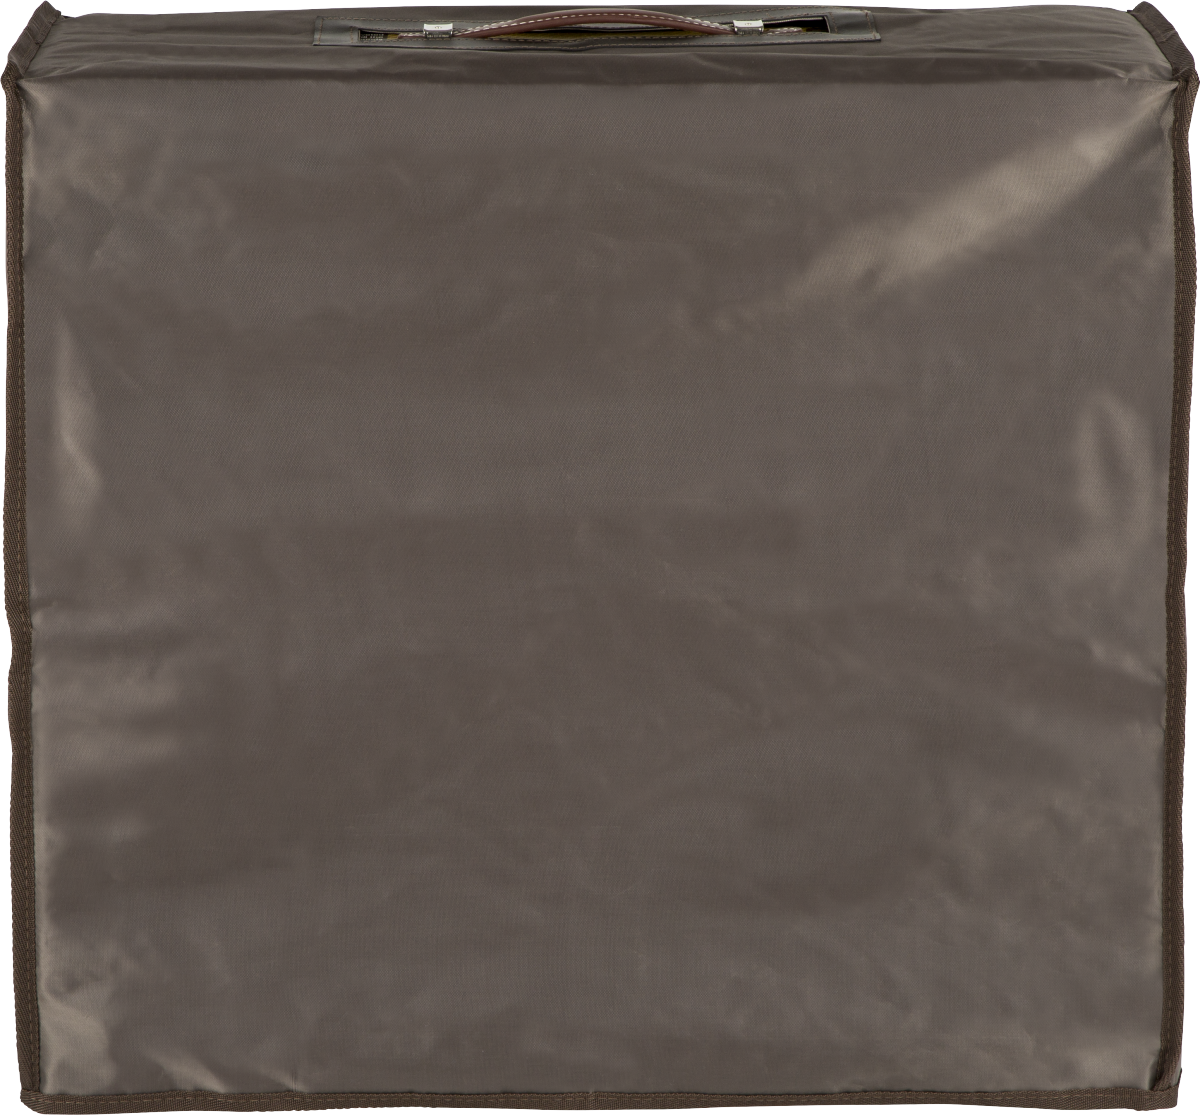 FENDER Amp Cover, 59 Bassman, Brown